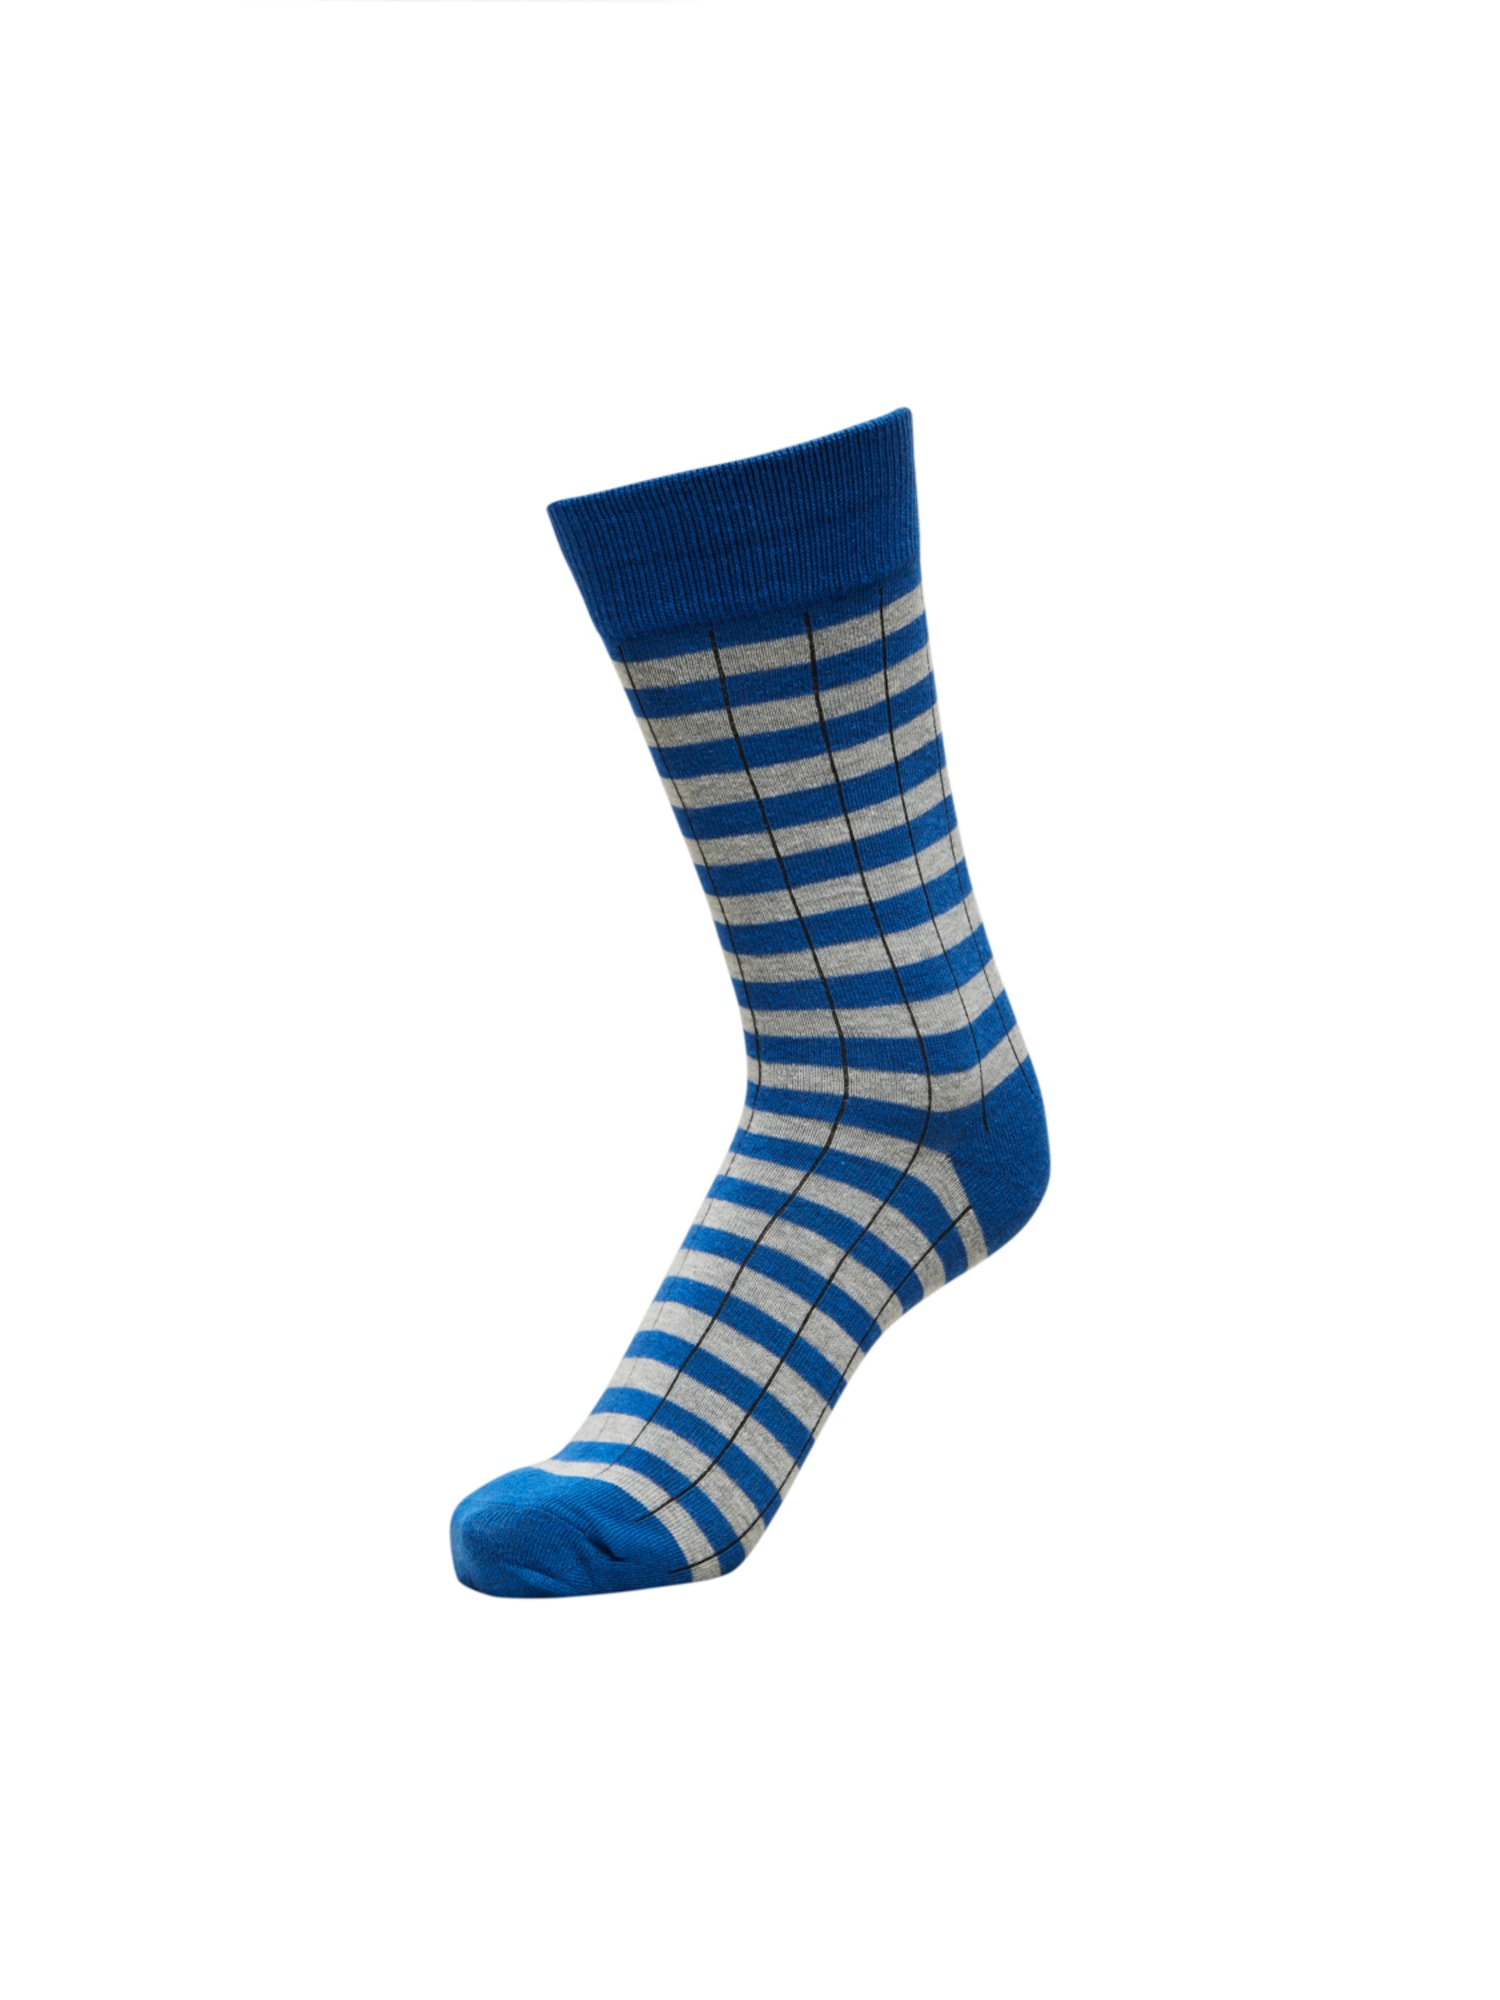 SELECTED HOMME Kojinės mėlyna / šviesiai pilka / tamsiai mėlyna